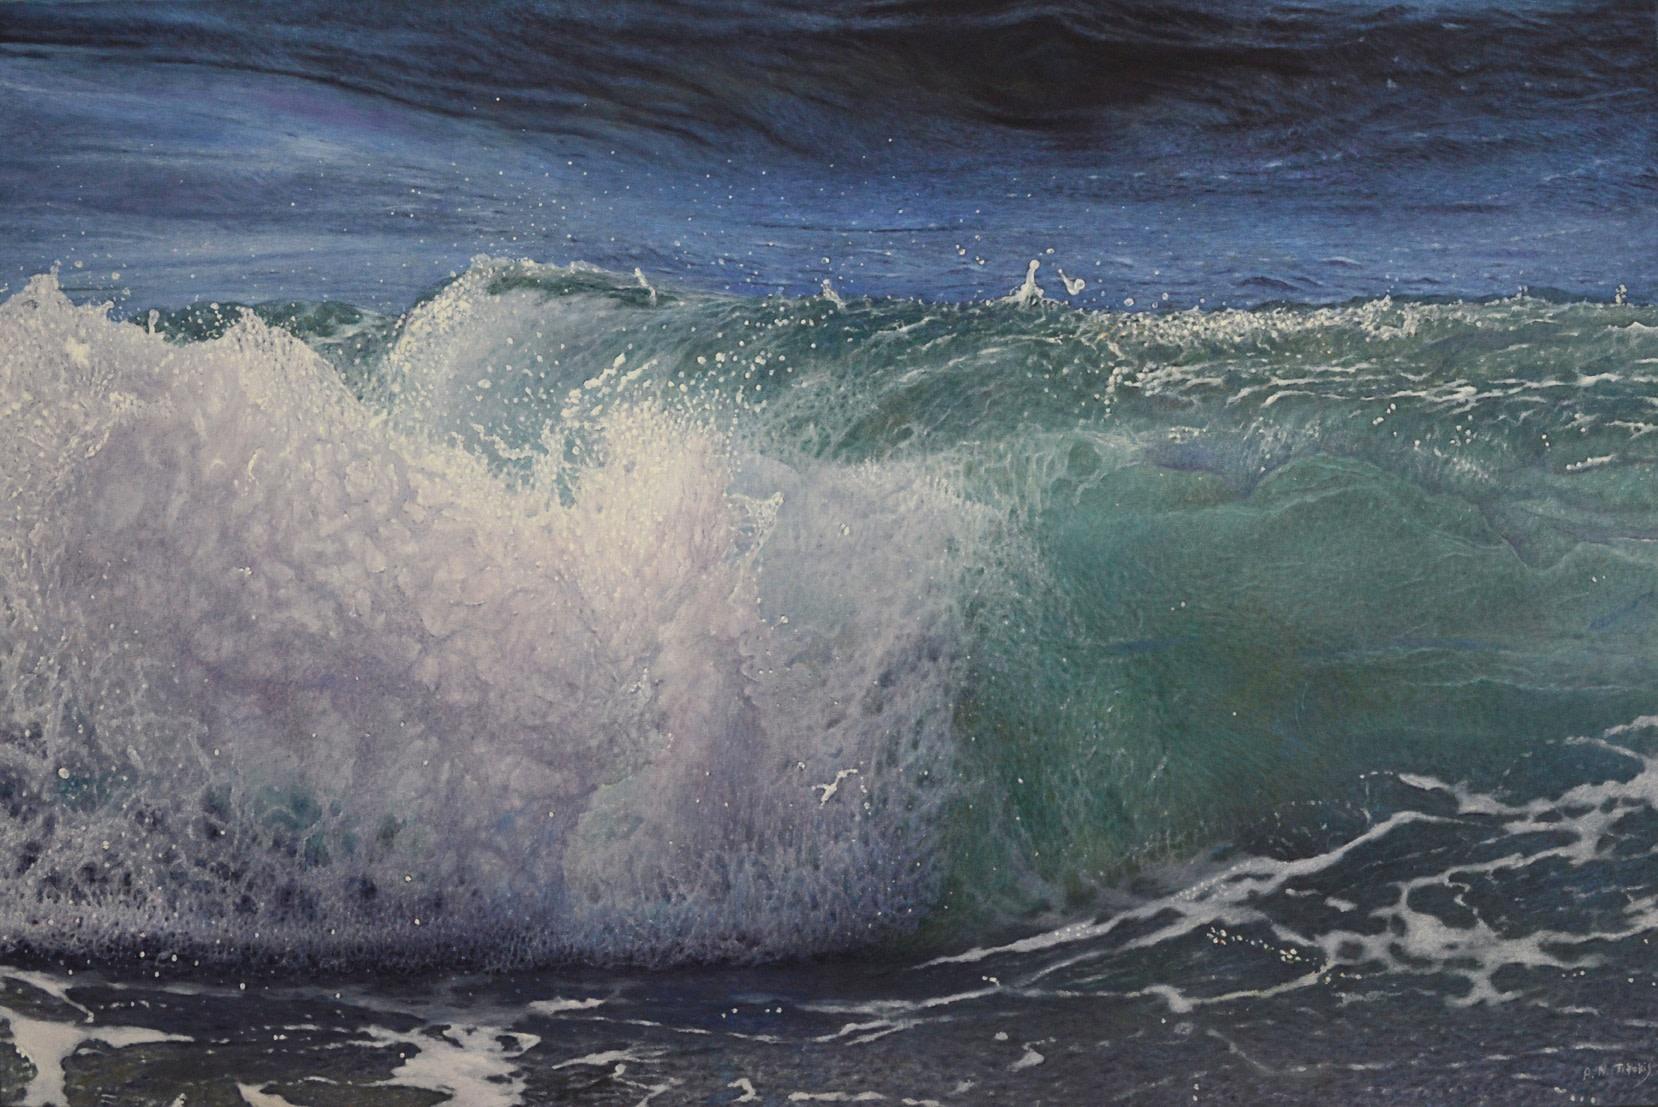 <span class=&#34;link fancybox-details-link&#34;><a href=&#34;/exhibitions/113/works/artworks2419/&#34;>View Detail Page</a></span><div class=&#34;artist&#34;><strong>Antonis Titakis</strong></div><div class=&#34;title&#34;><em>Crashing Wave</em>, 2016</div><div class=&#34;medium&#34;>Oil on canvas</div><div class=&#34;dimensions&#34;>100 x 150</div>